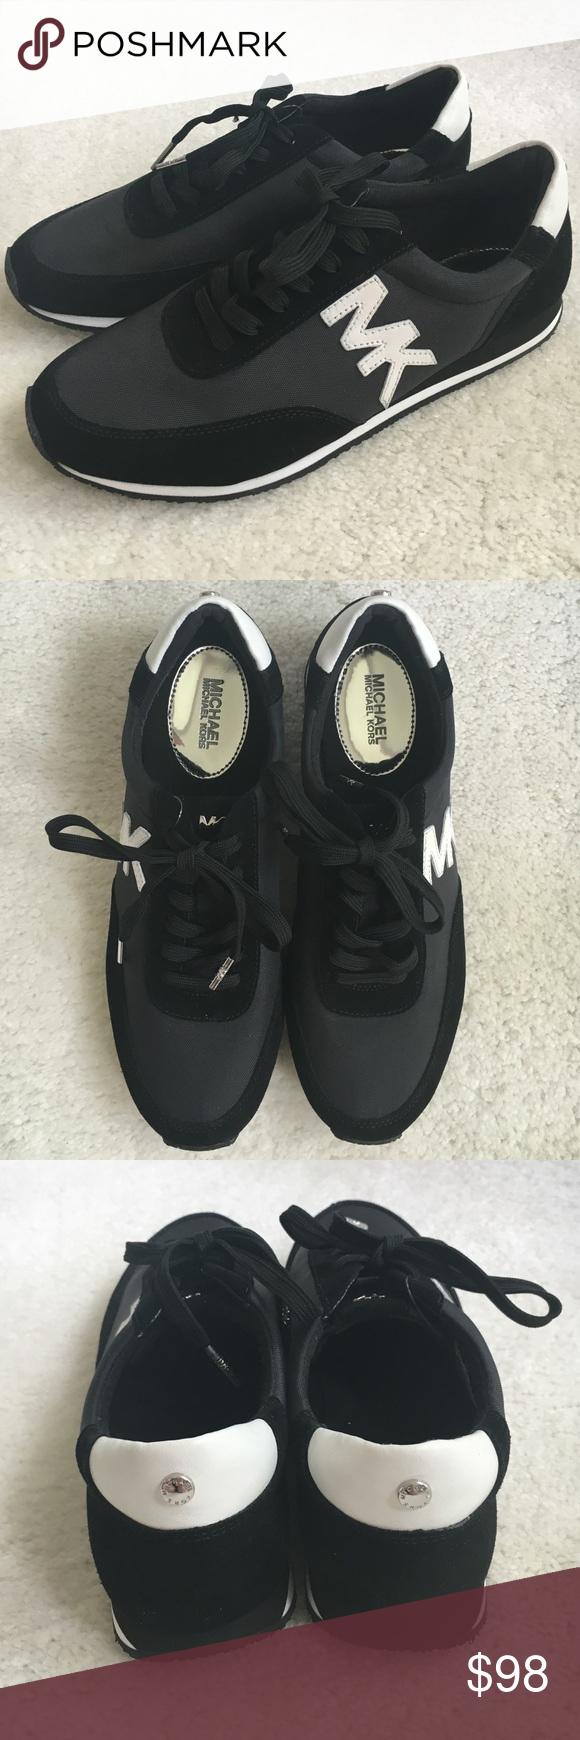 ee85aad202bbd Michael Kors tennis shoes Black and White tennis shoes by Michael Kors.  Great condition ( not included in bundle deal) Michael Kors Shoes Sneakers